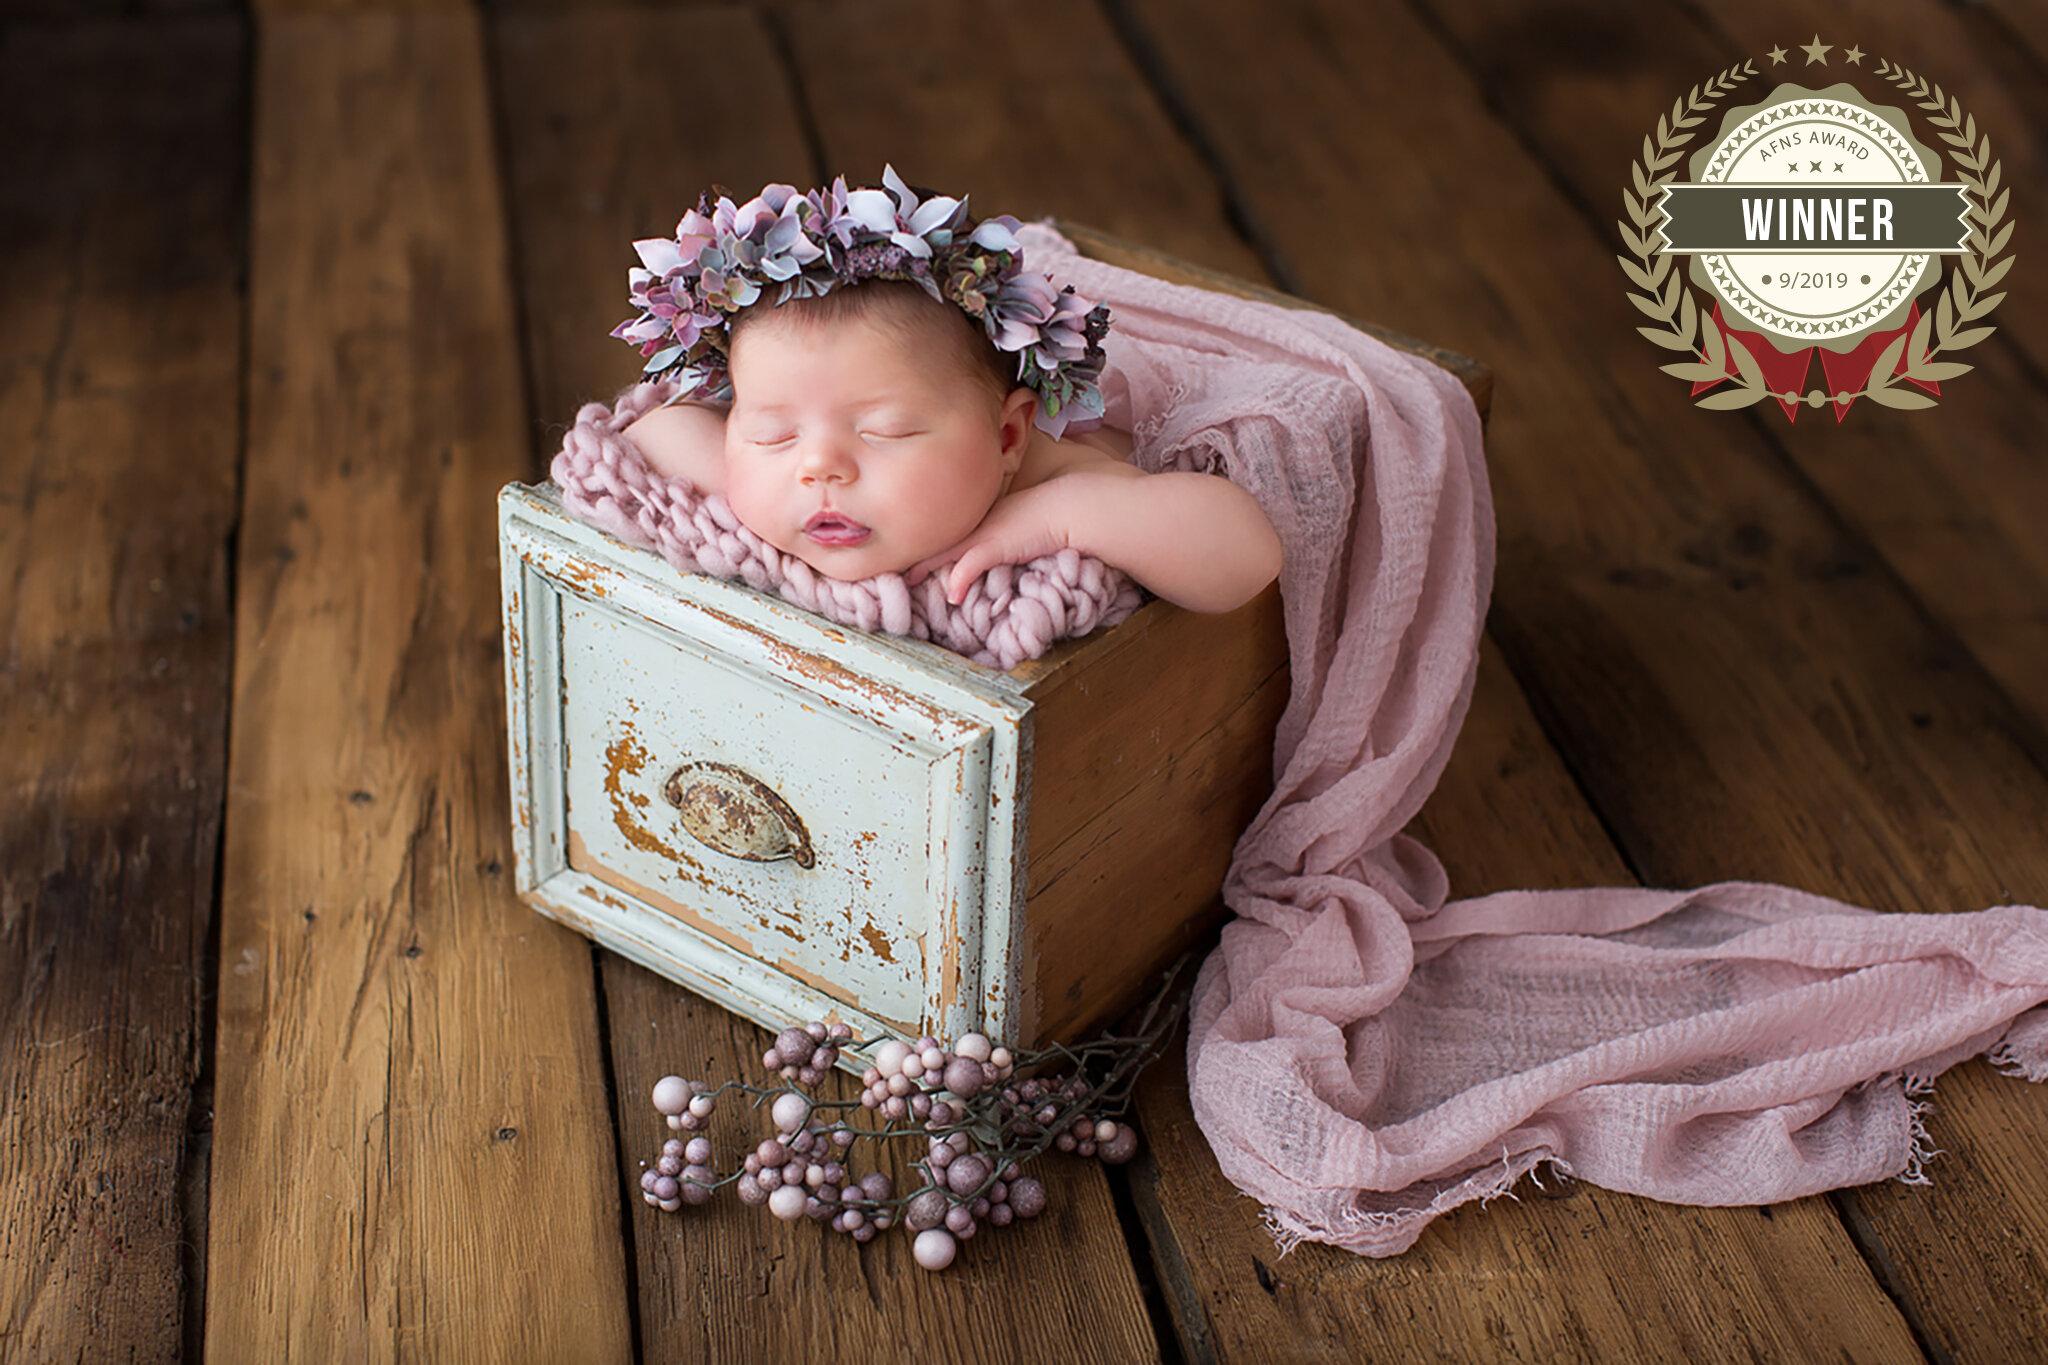 56906439_newbornfotograph-23-babyfoto-babybauch-pregnant-anja-bolman-fotografie-reichenbach.jpg